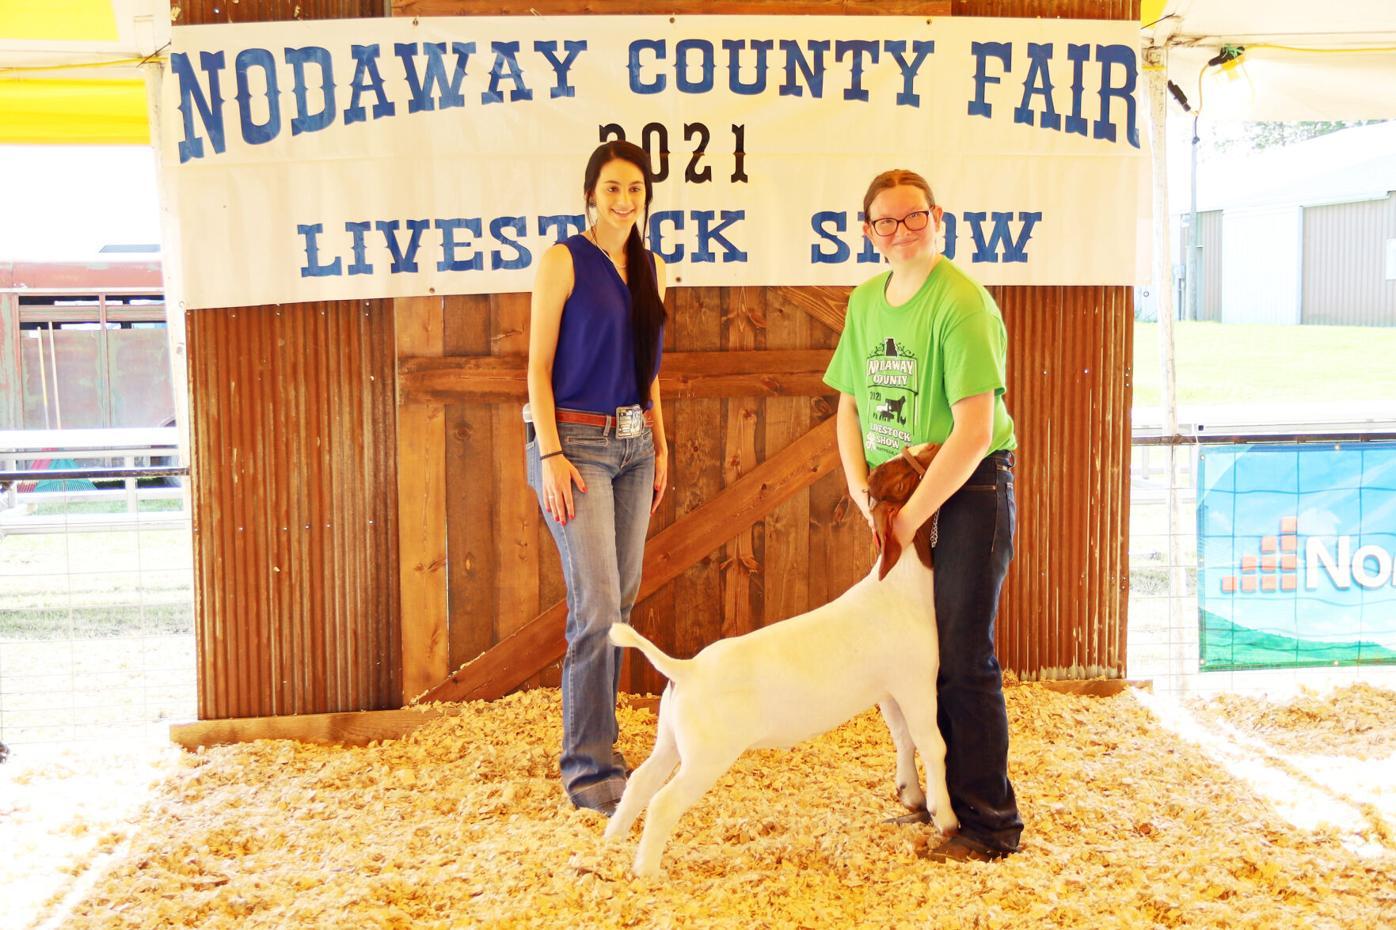 7-15-21 LS - Goat 4 Nod Co Champ Allison Roberts.jpg